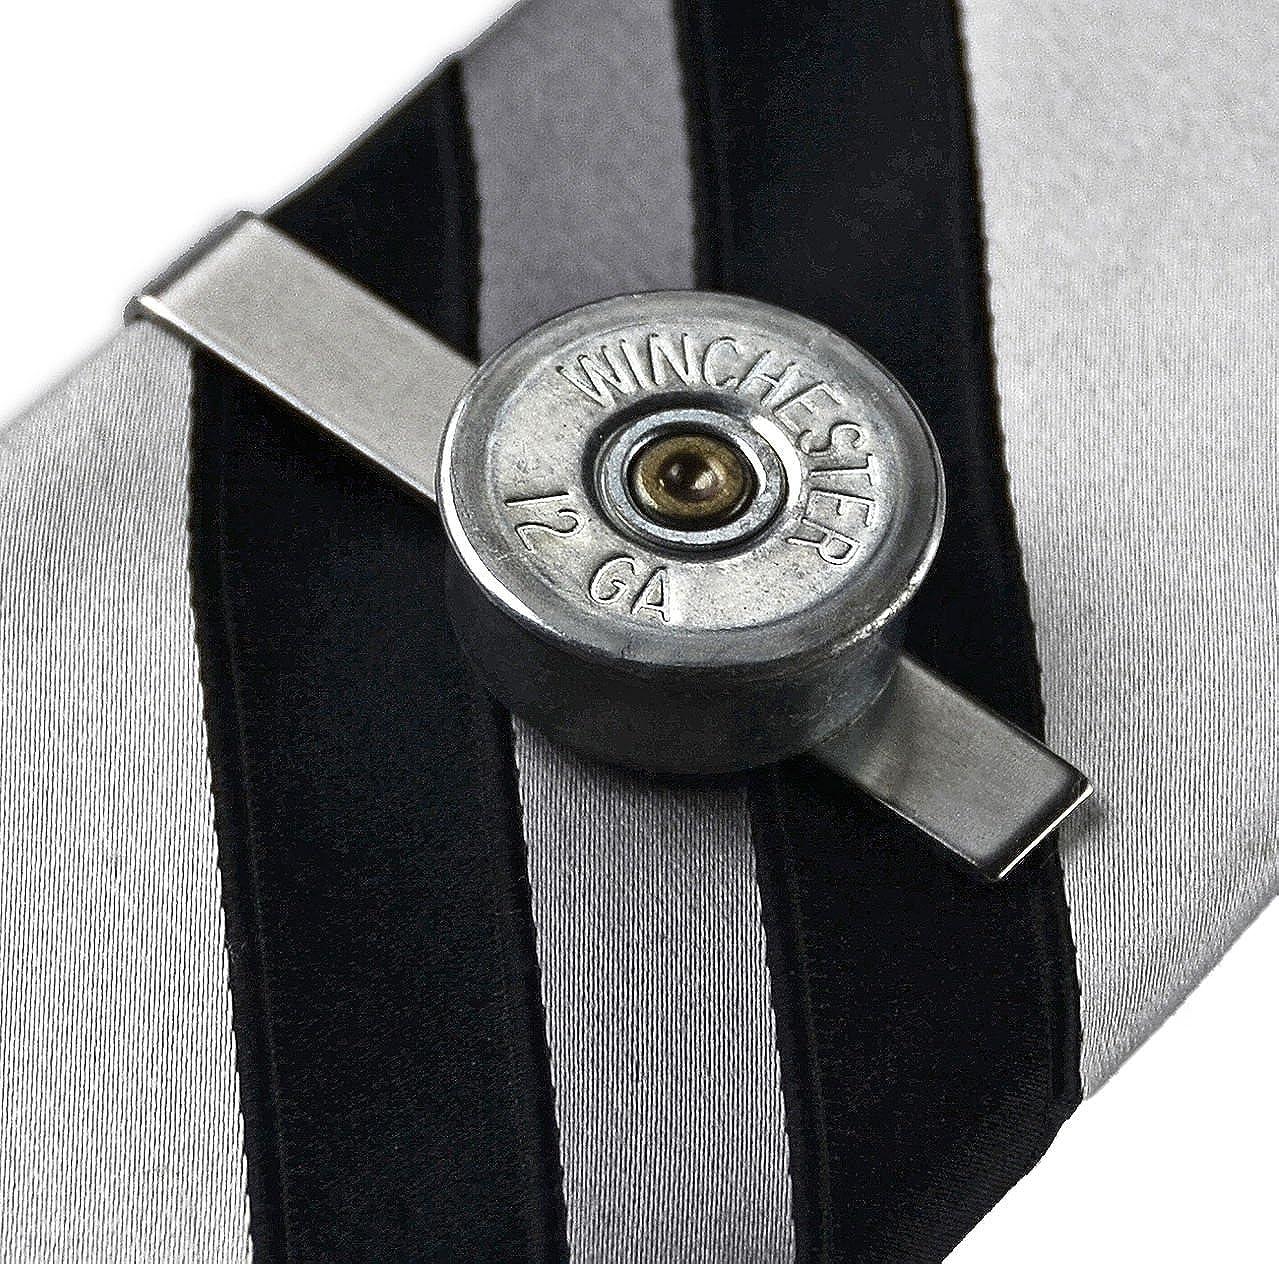 Quality Handcrafts Guaranteed Shotgun Shell Tie Clip